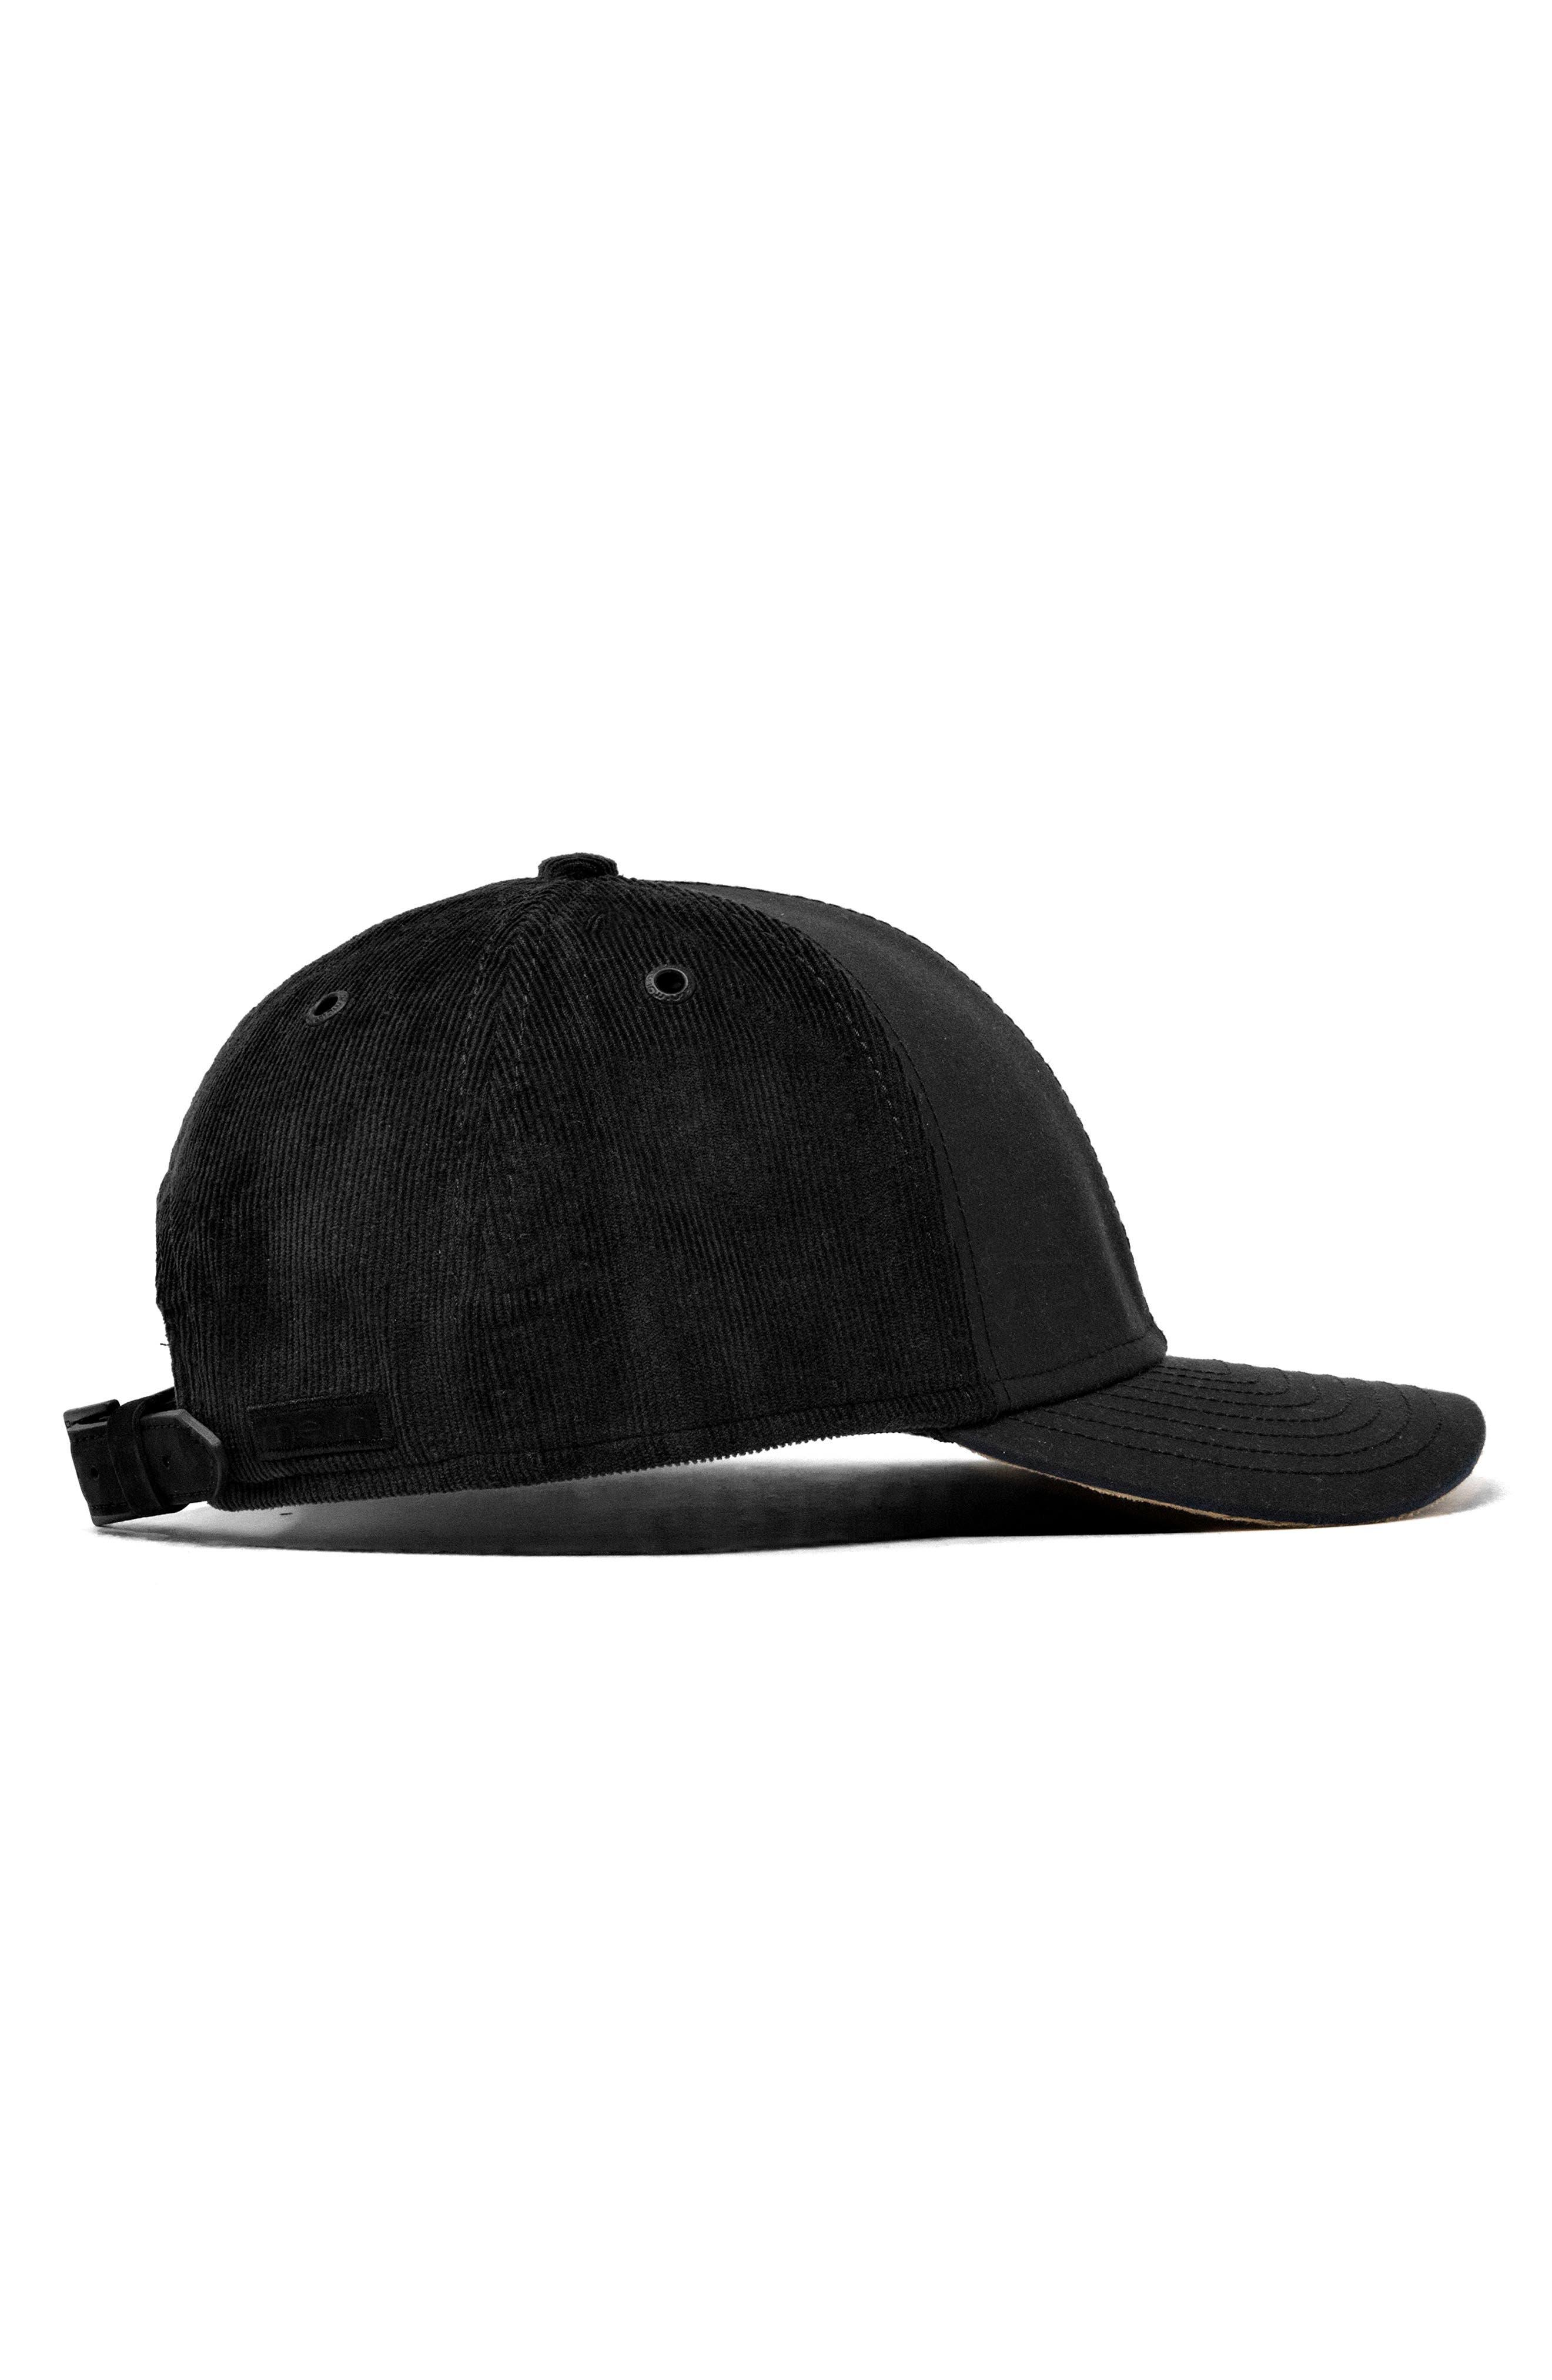 Discovery Baseball Cap,                             Alternate thumbnail 5, color,                             BLACK